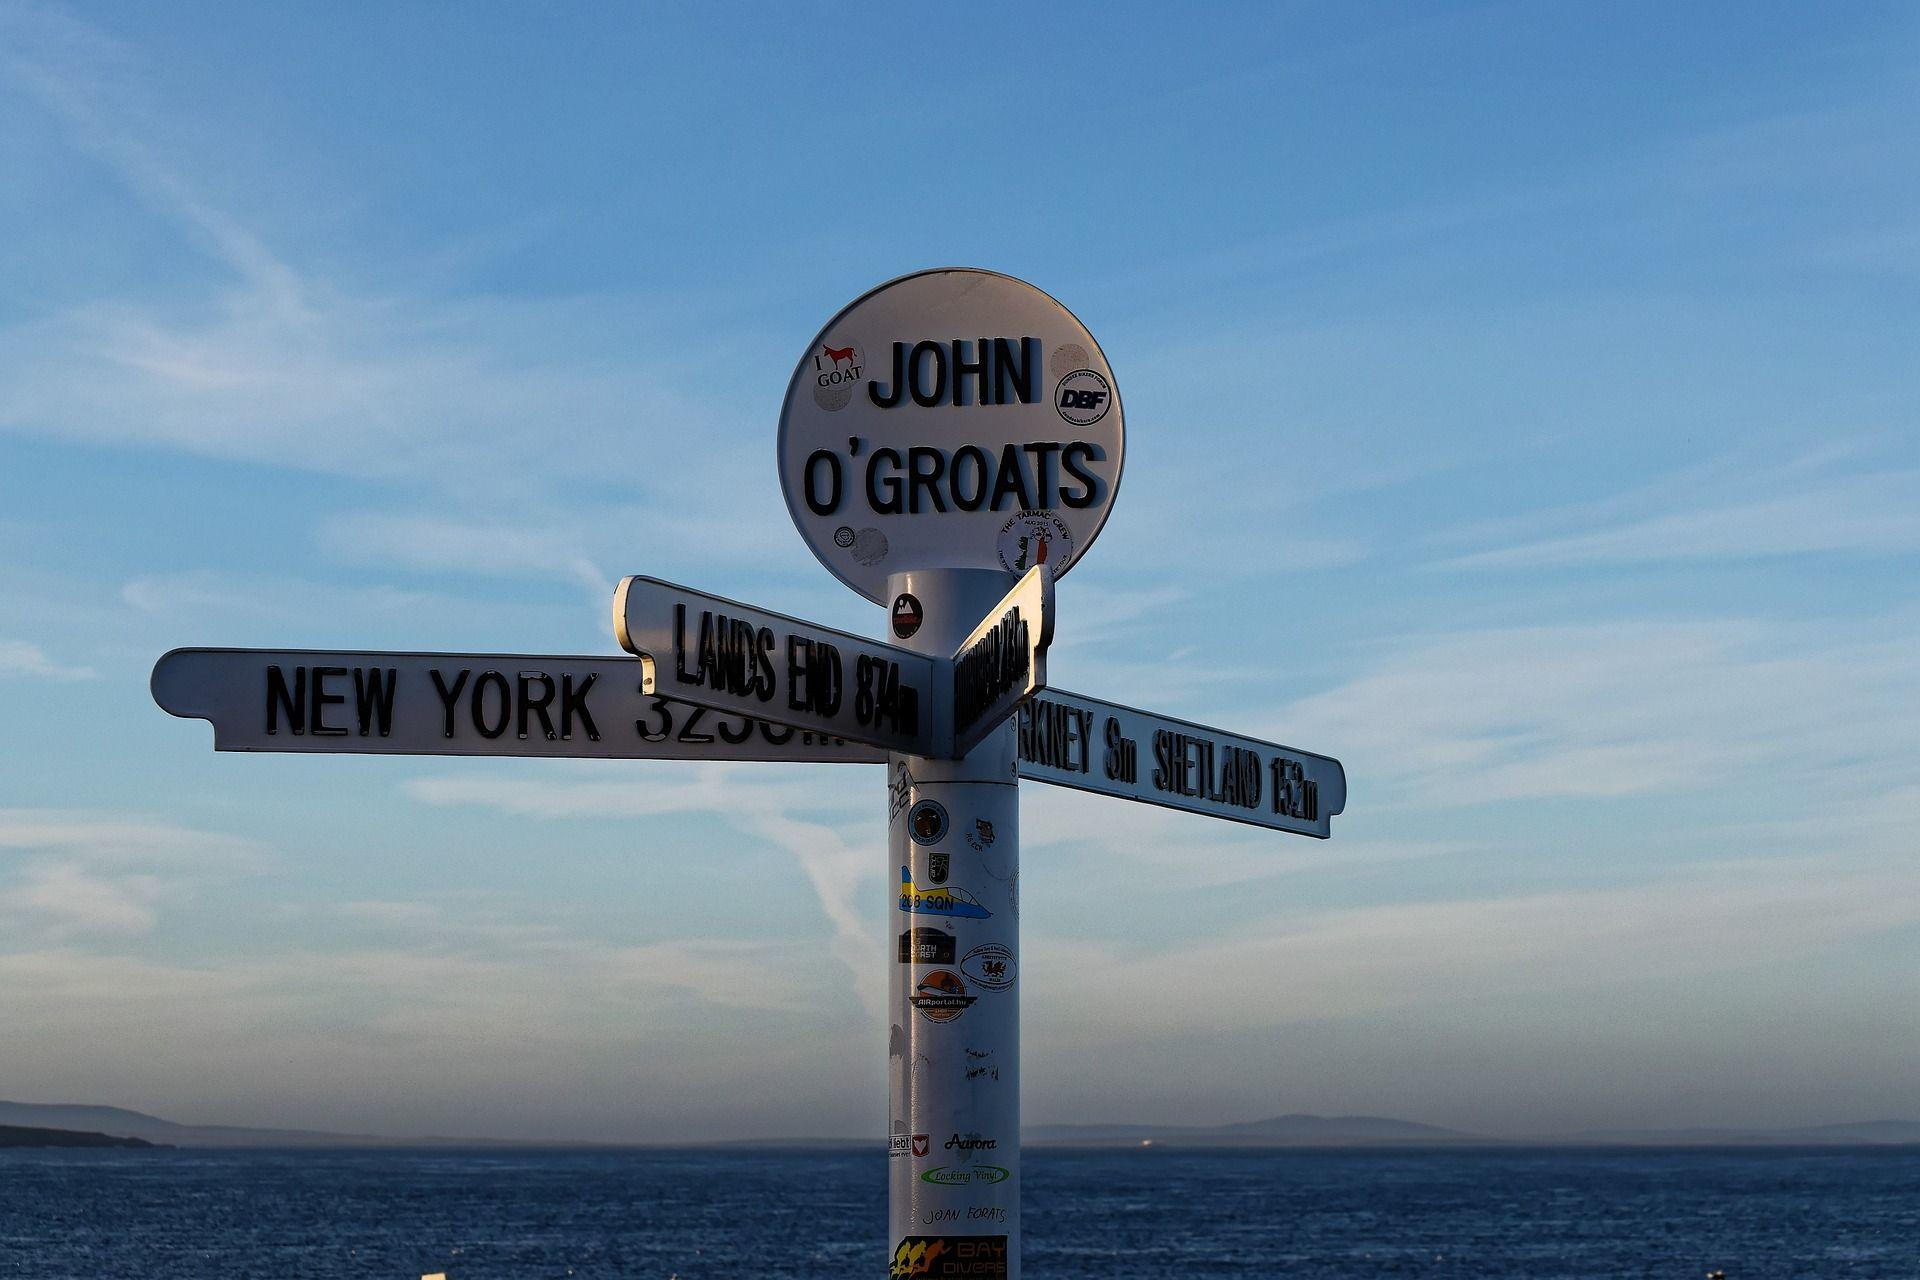 john-ogroats-1007927_1920